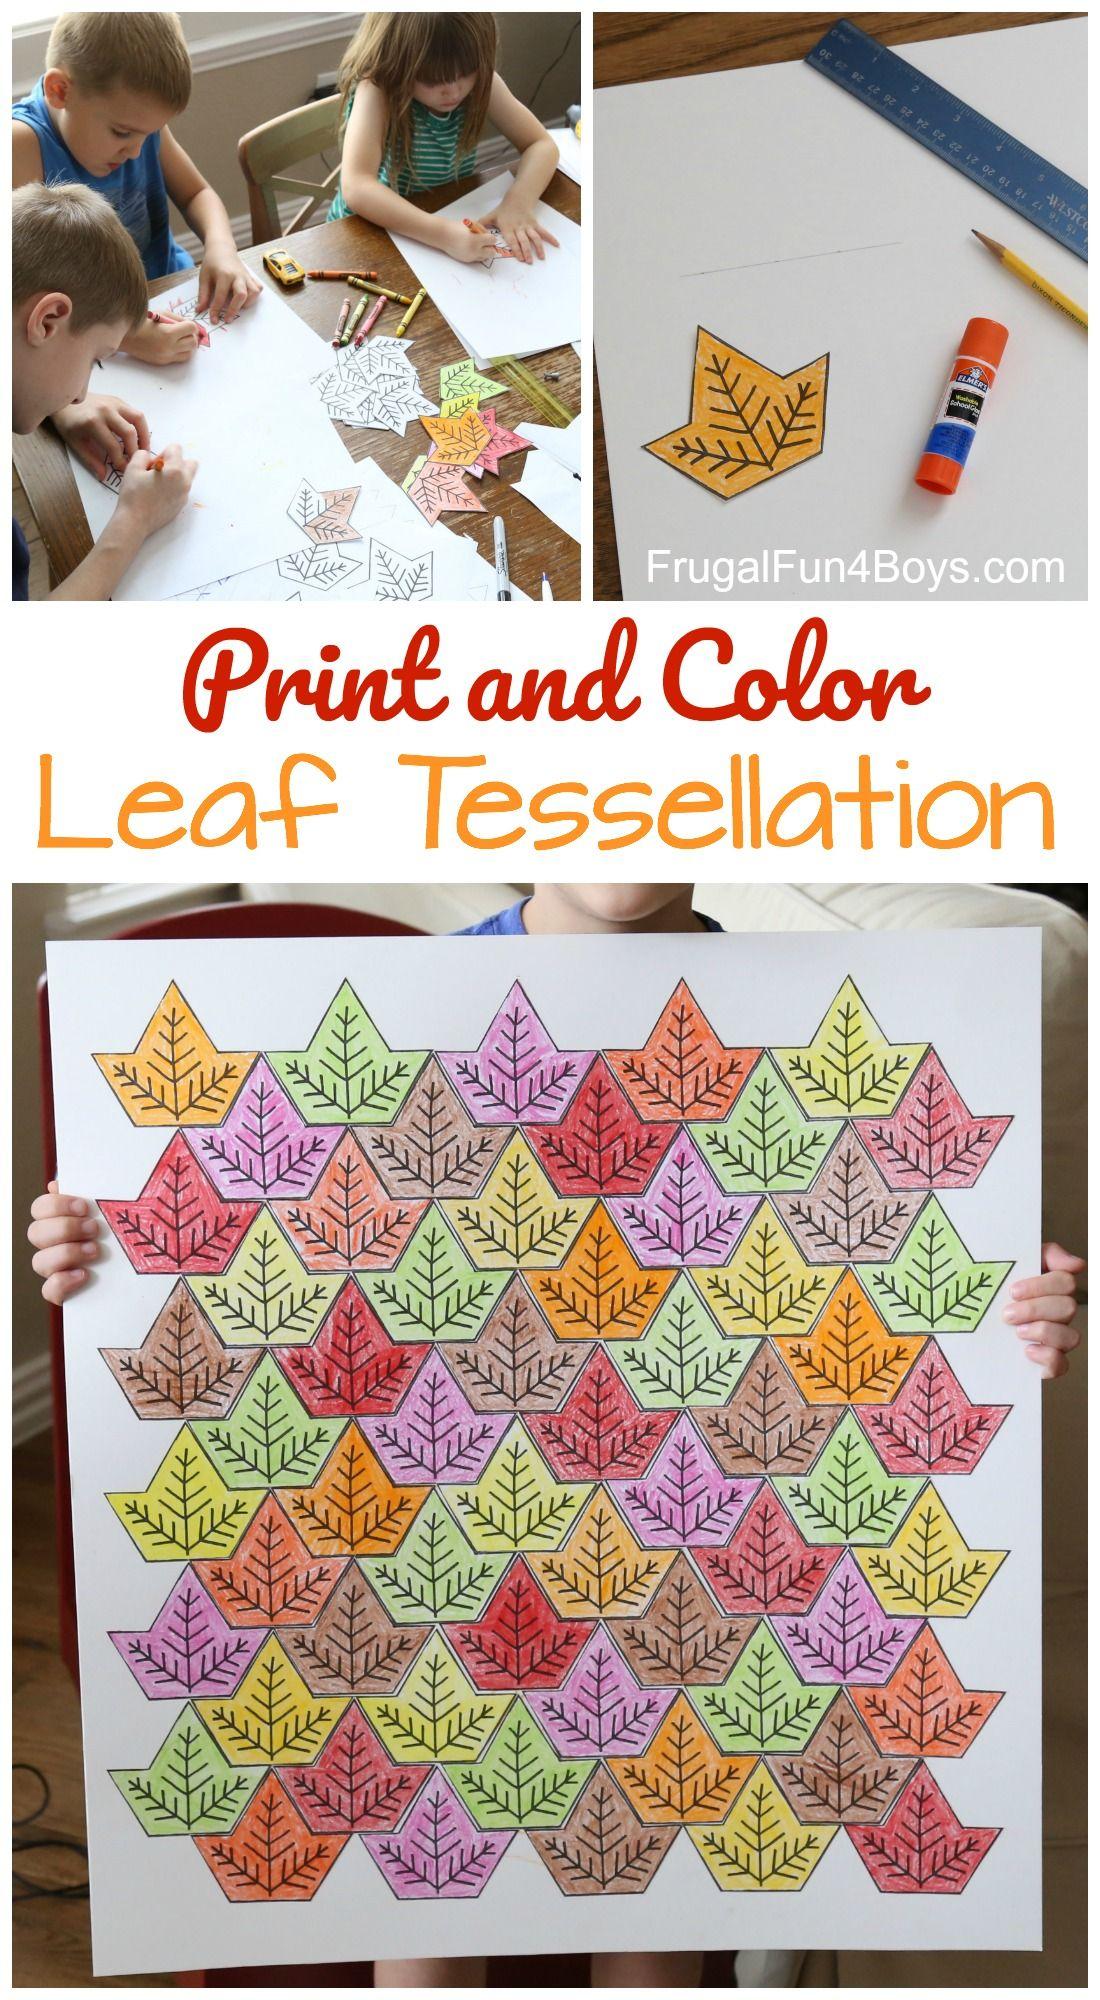 Leaf Tessellation Collaborative Stem Art Project